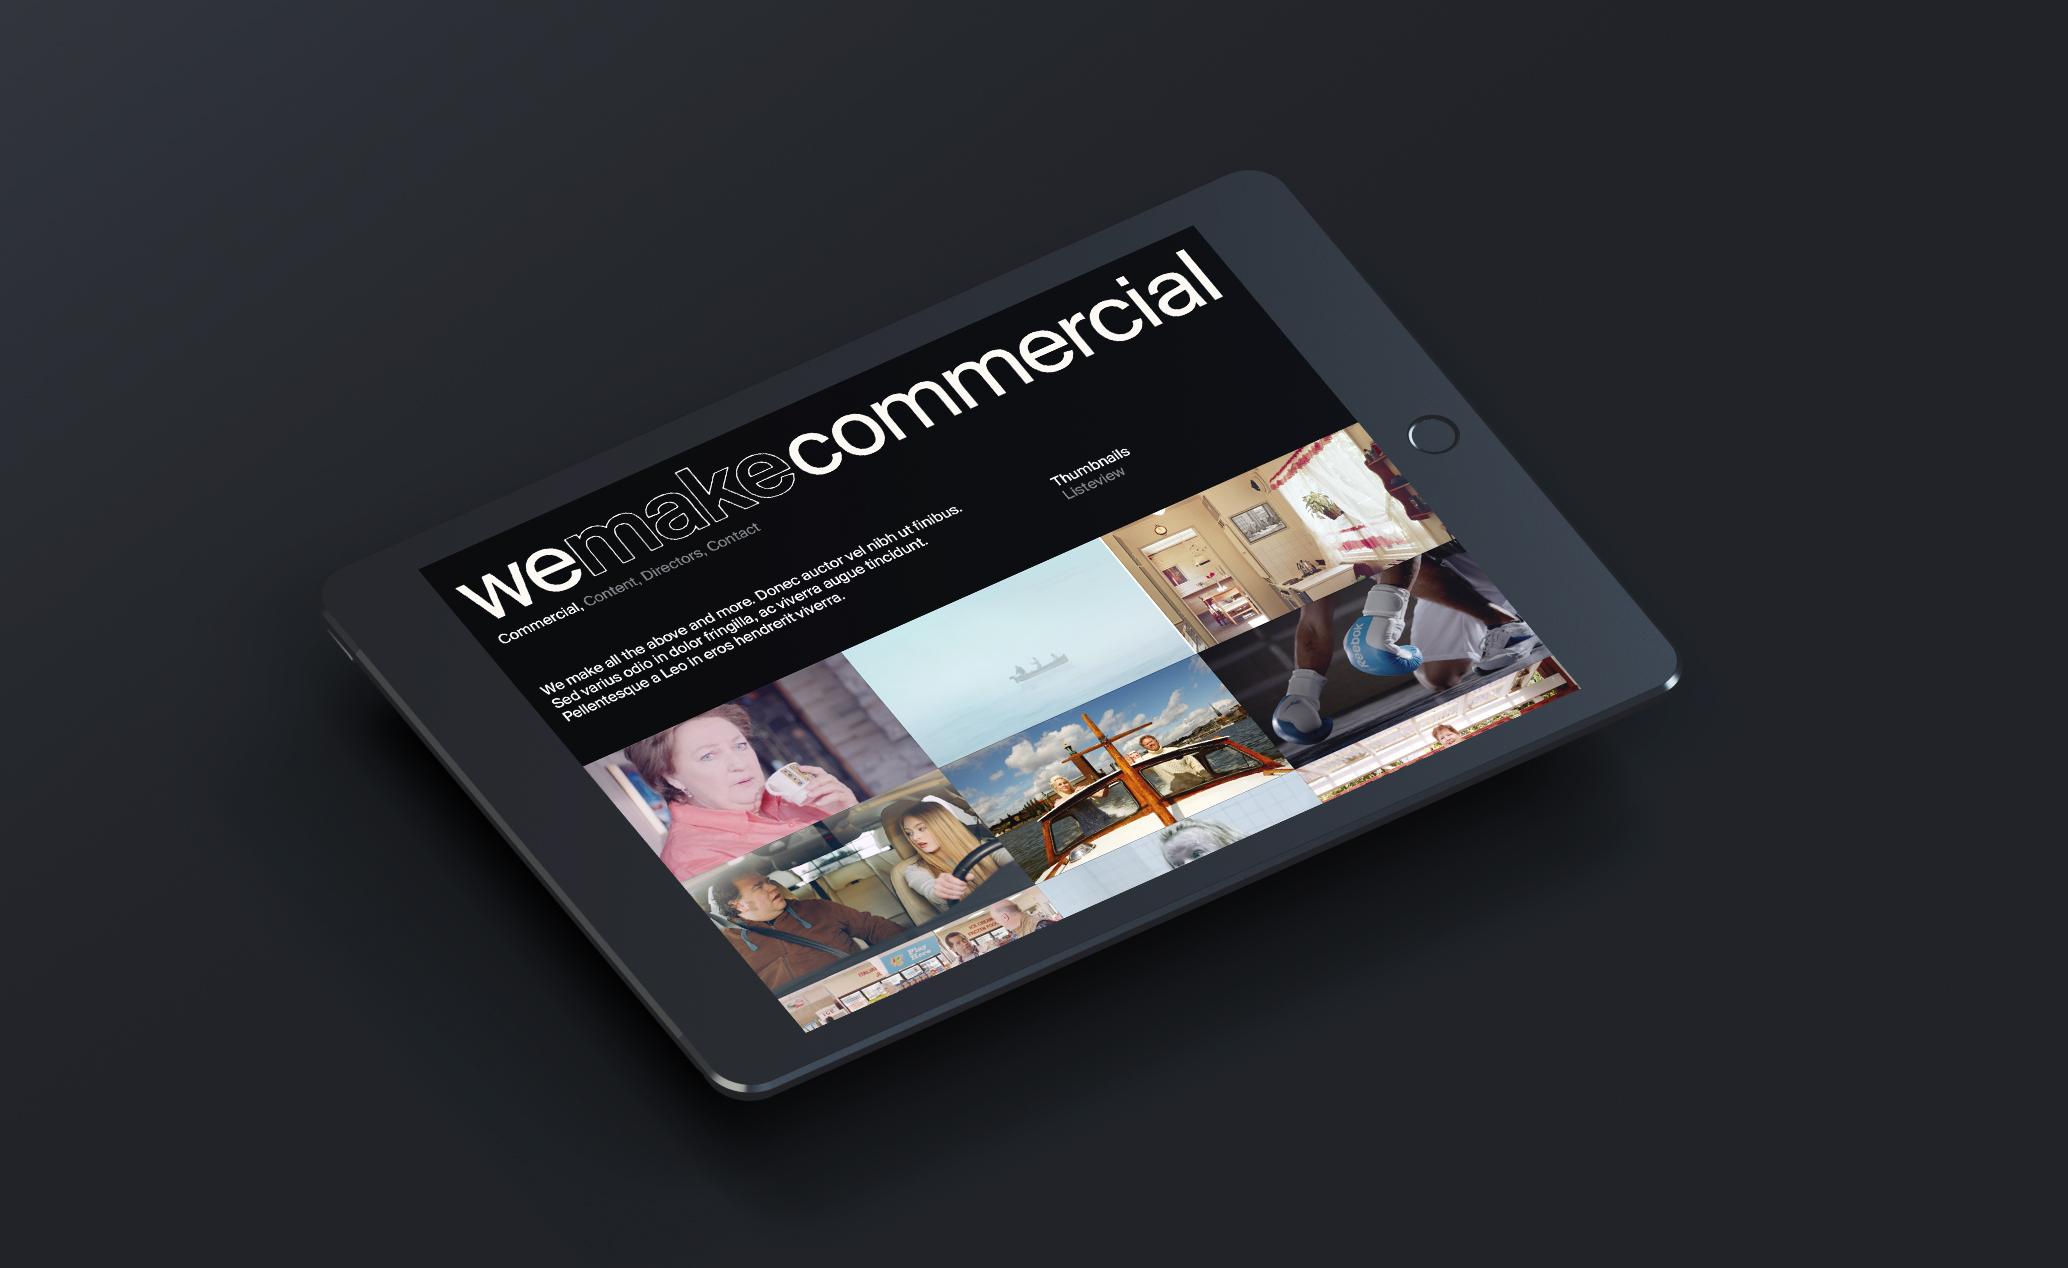 wemake_web_commerc.jpg